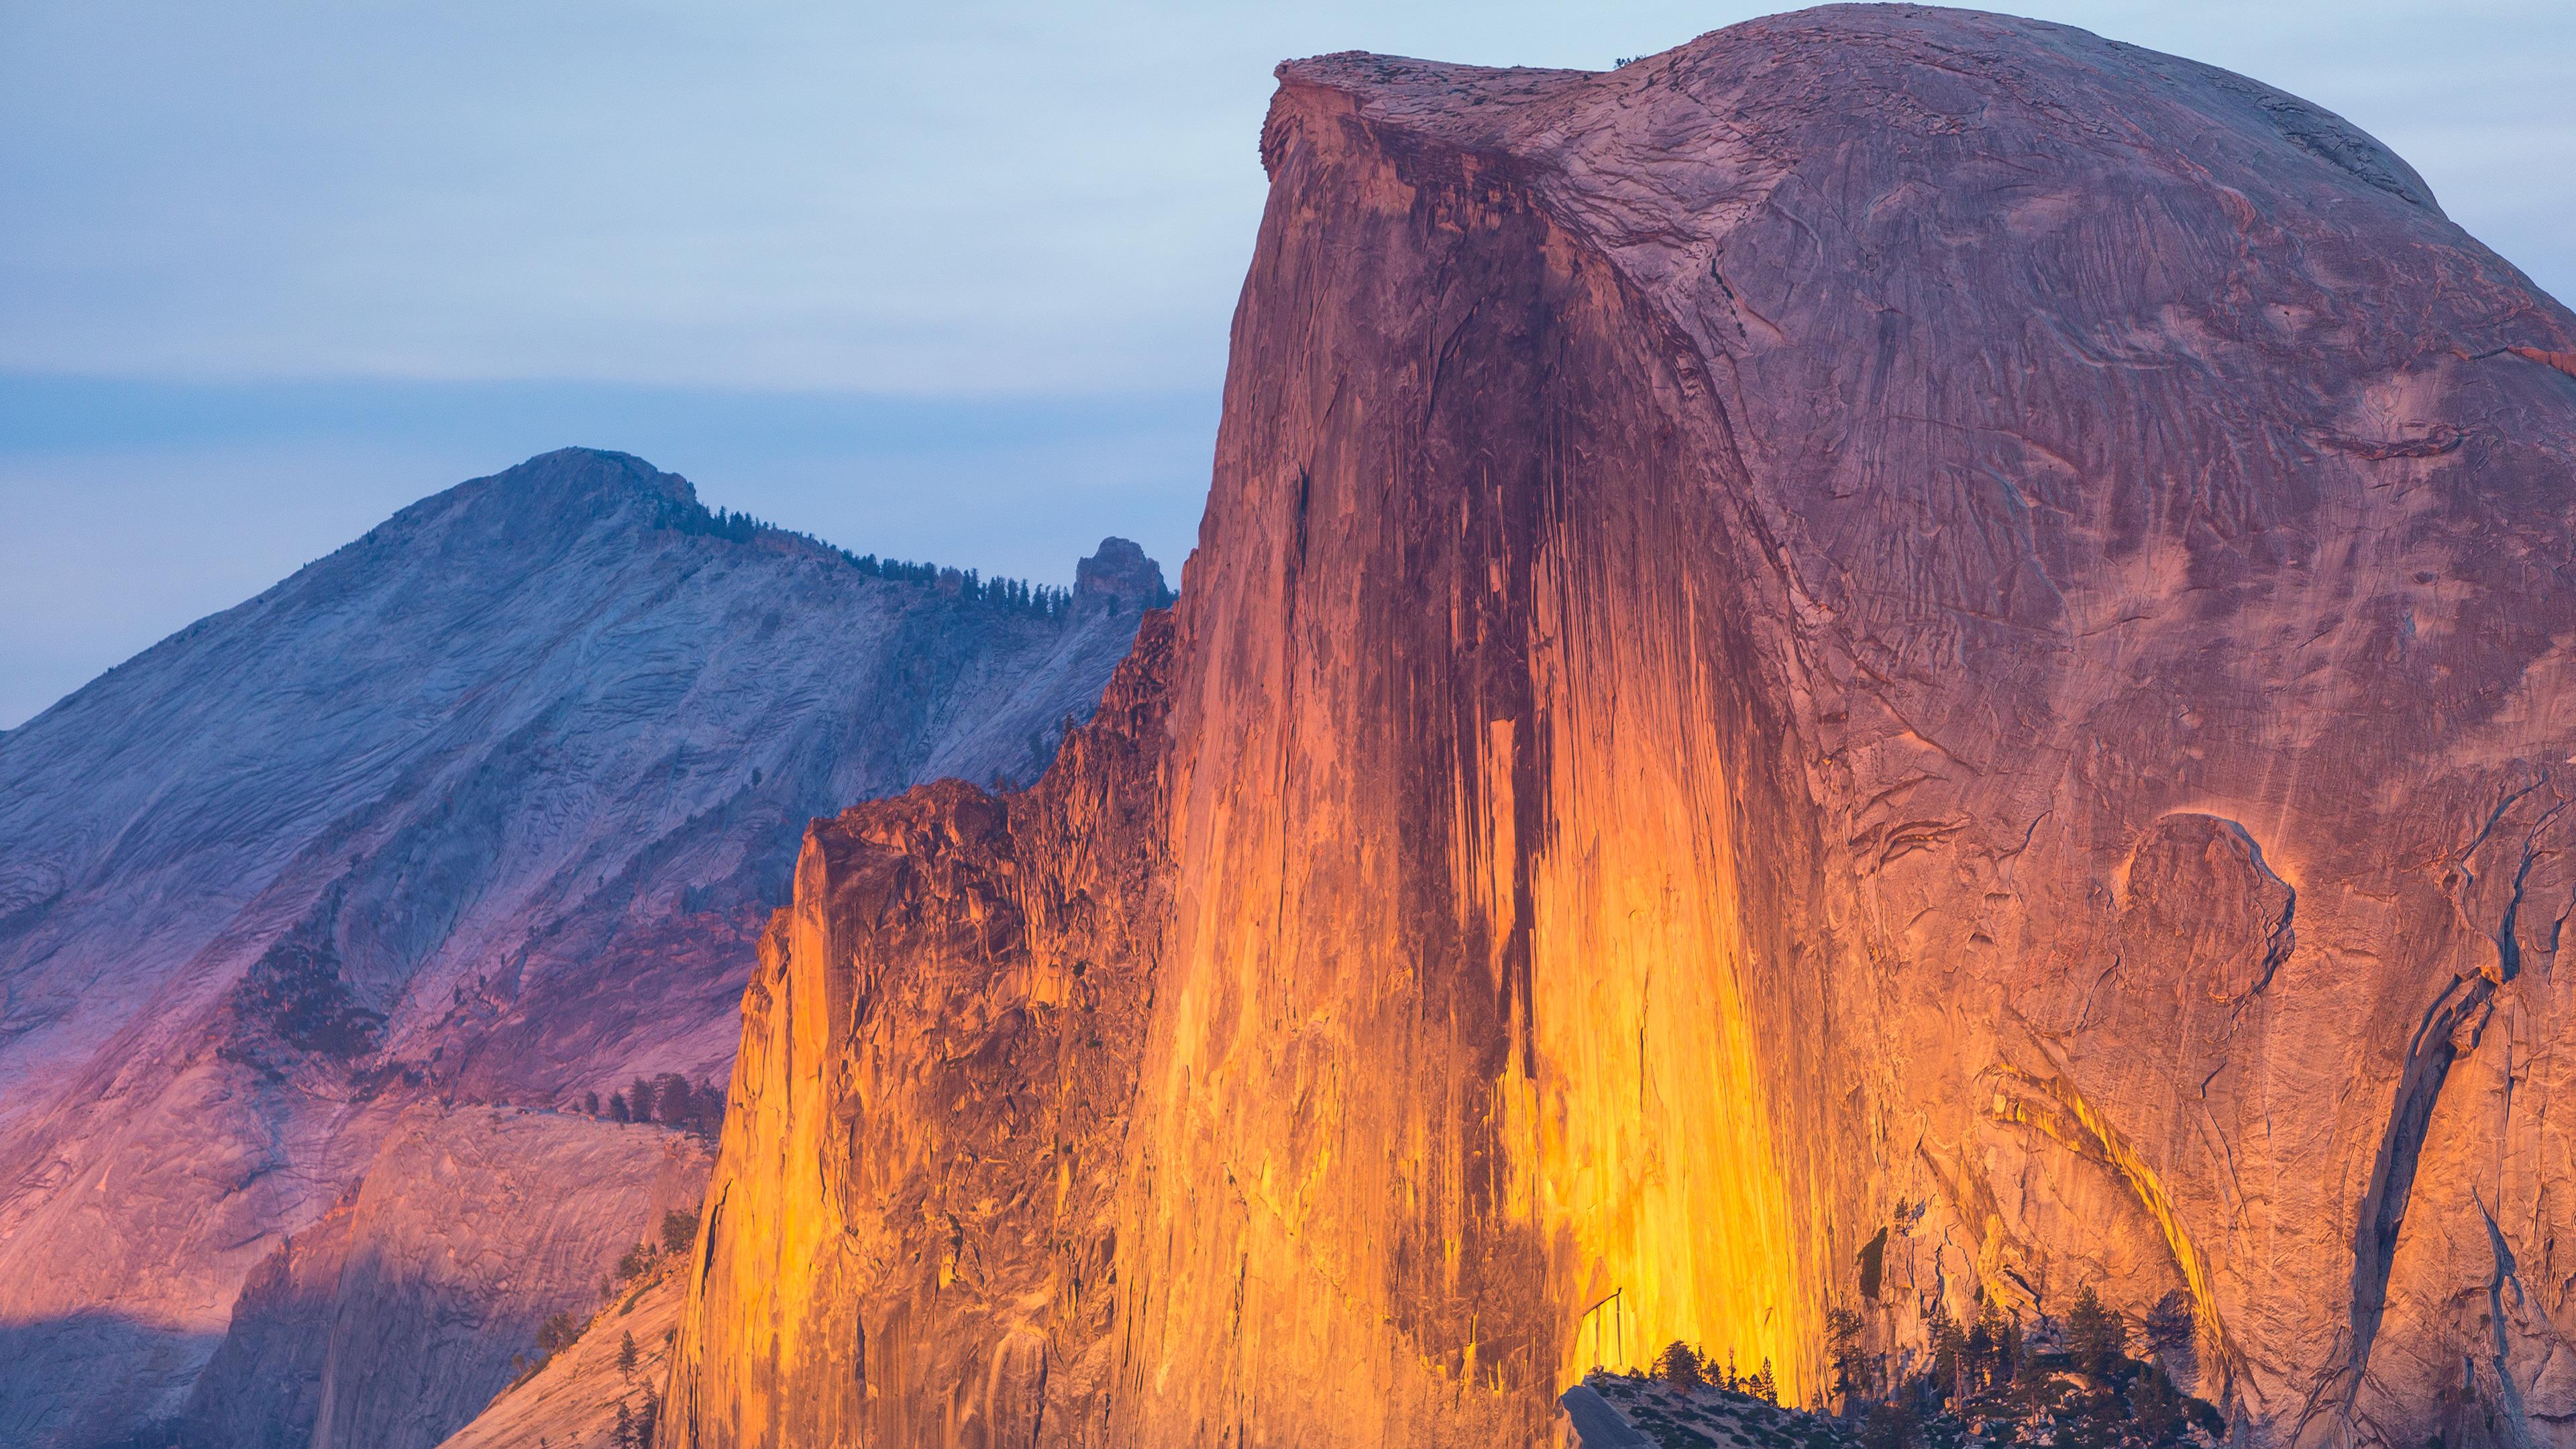 Wallpaper 4k Yosemite Sun Rays 4k 4k Wallpapers Hd